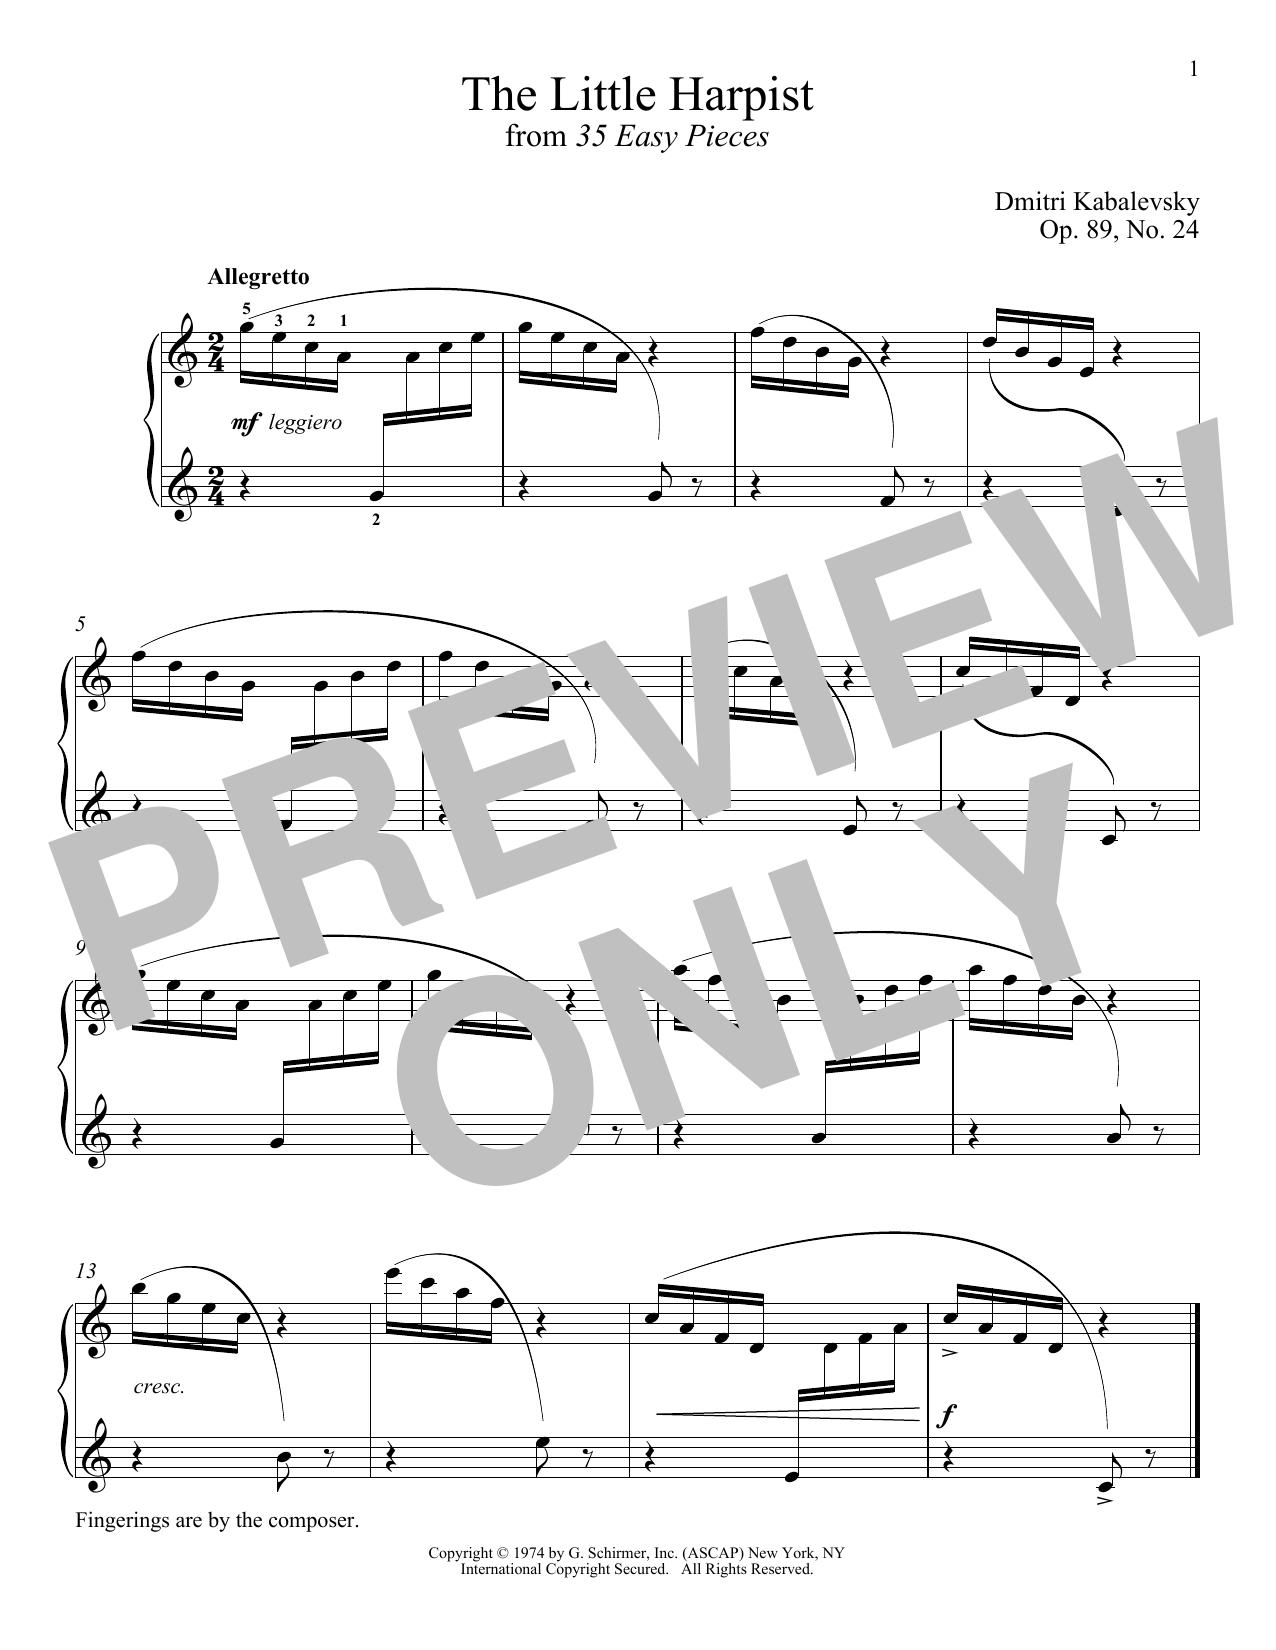 The Little Harpist, Op. 89, No. 24 (Piano Solo)